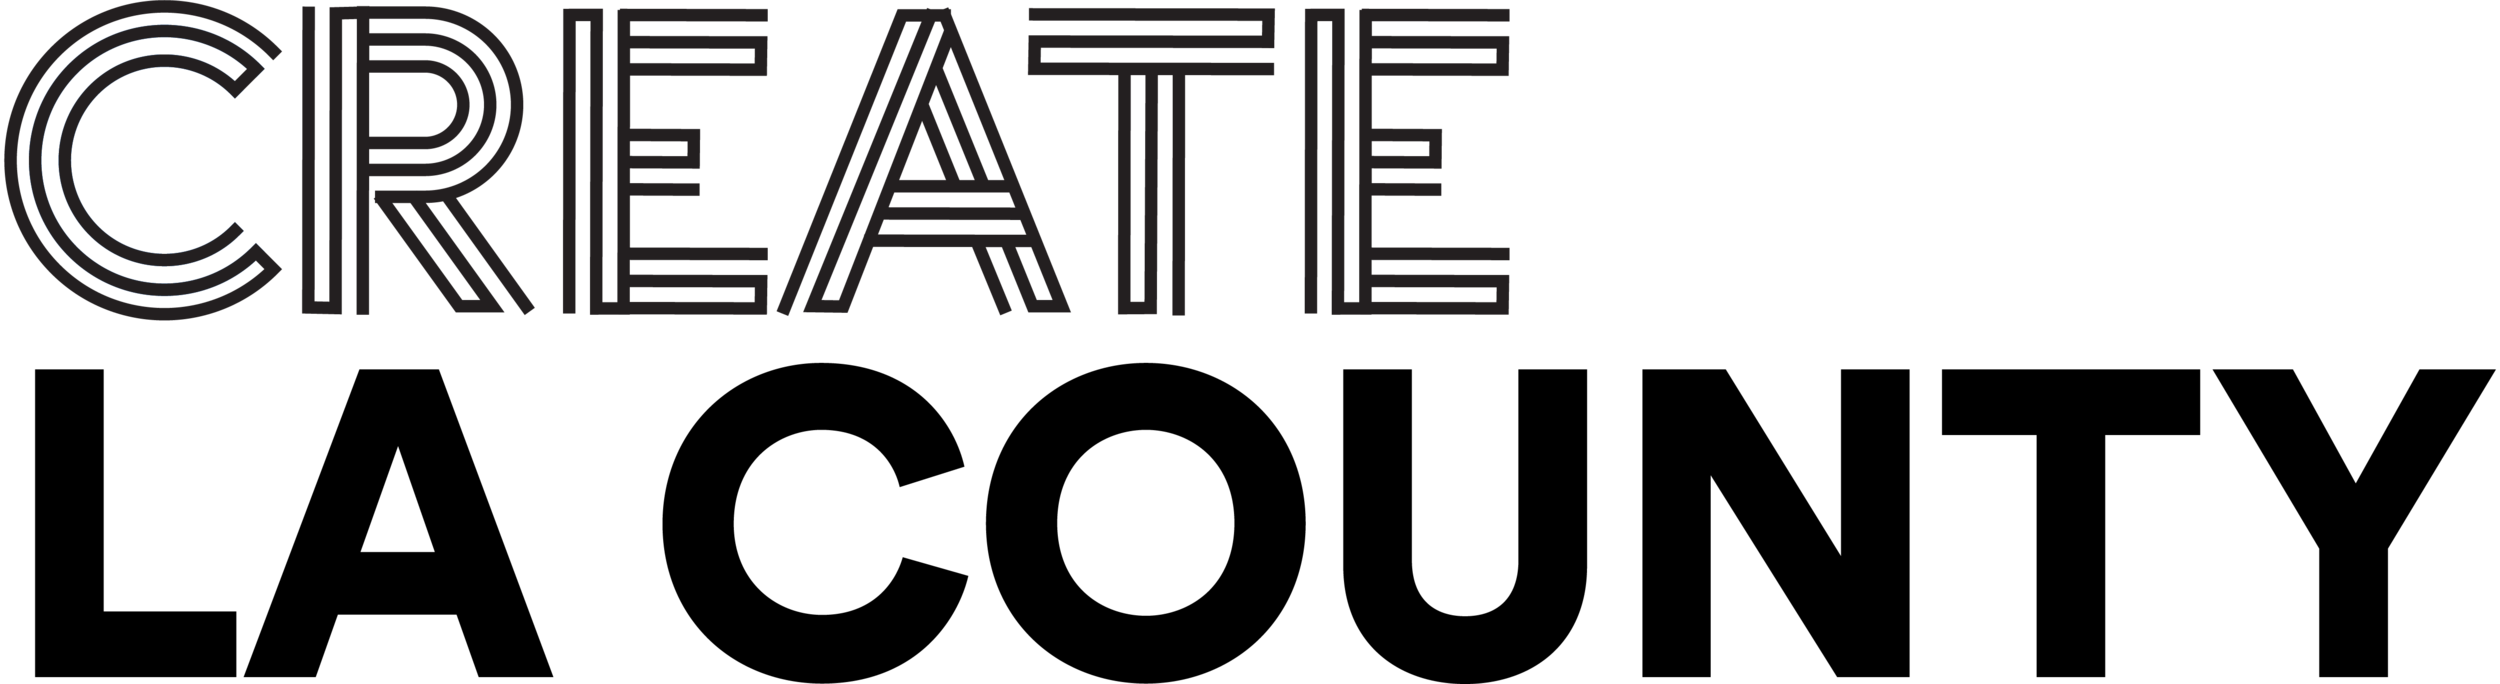 Create LA Logo Lockup-01 black.png